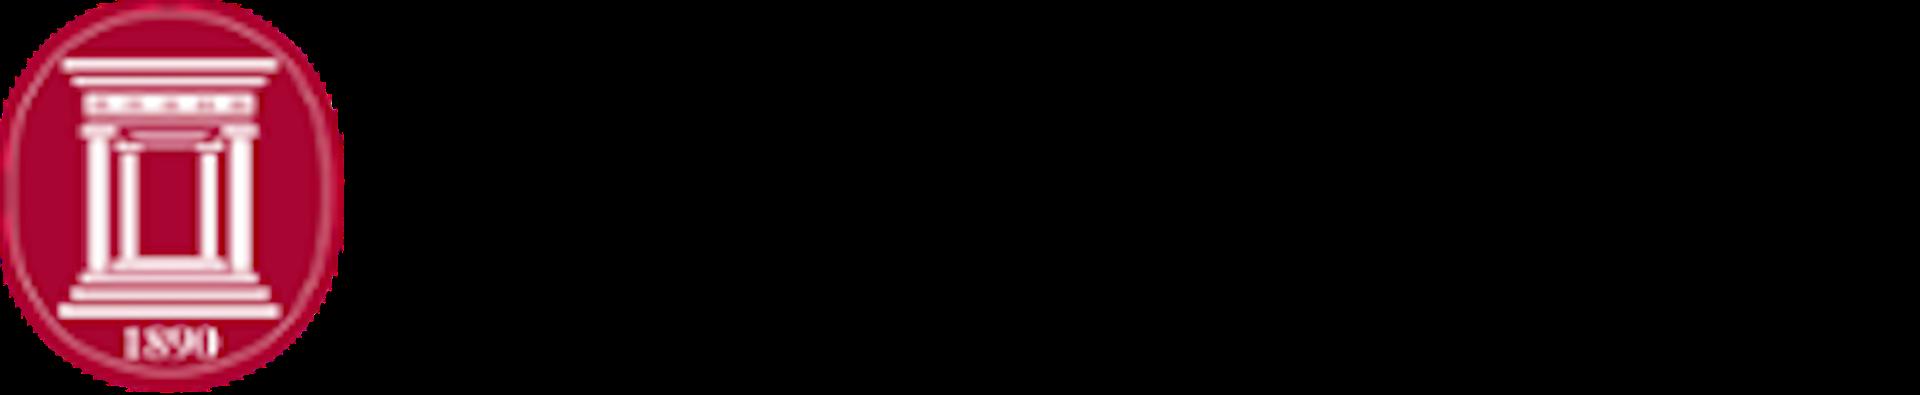 Logo 1522789657.png?ixlib=rb 1.1